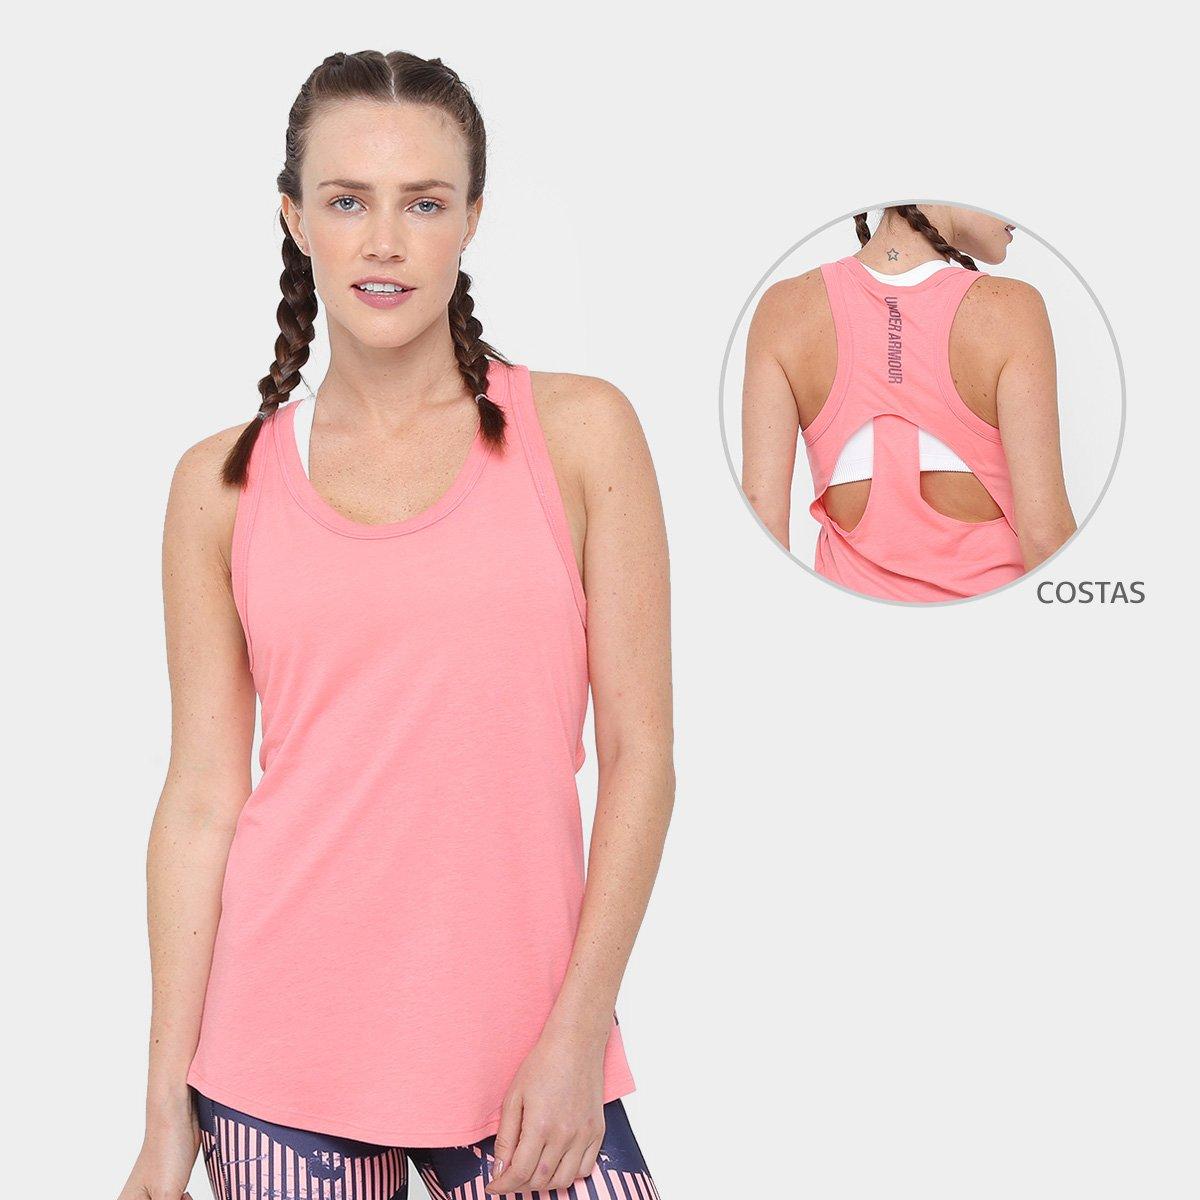 ec0443697 Regata Under Armour Triblend Feminina - Rosa | Allianz Parque Shop